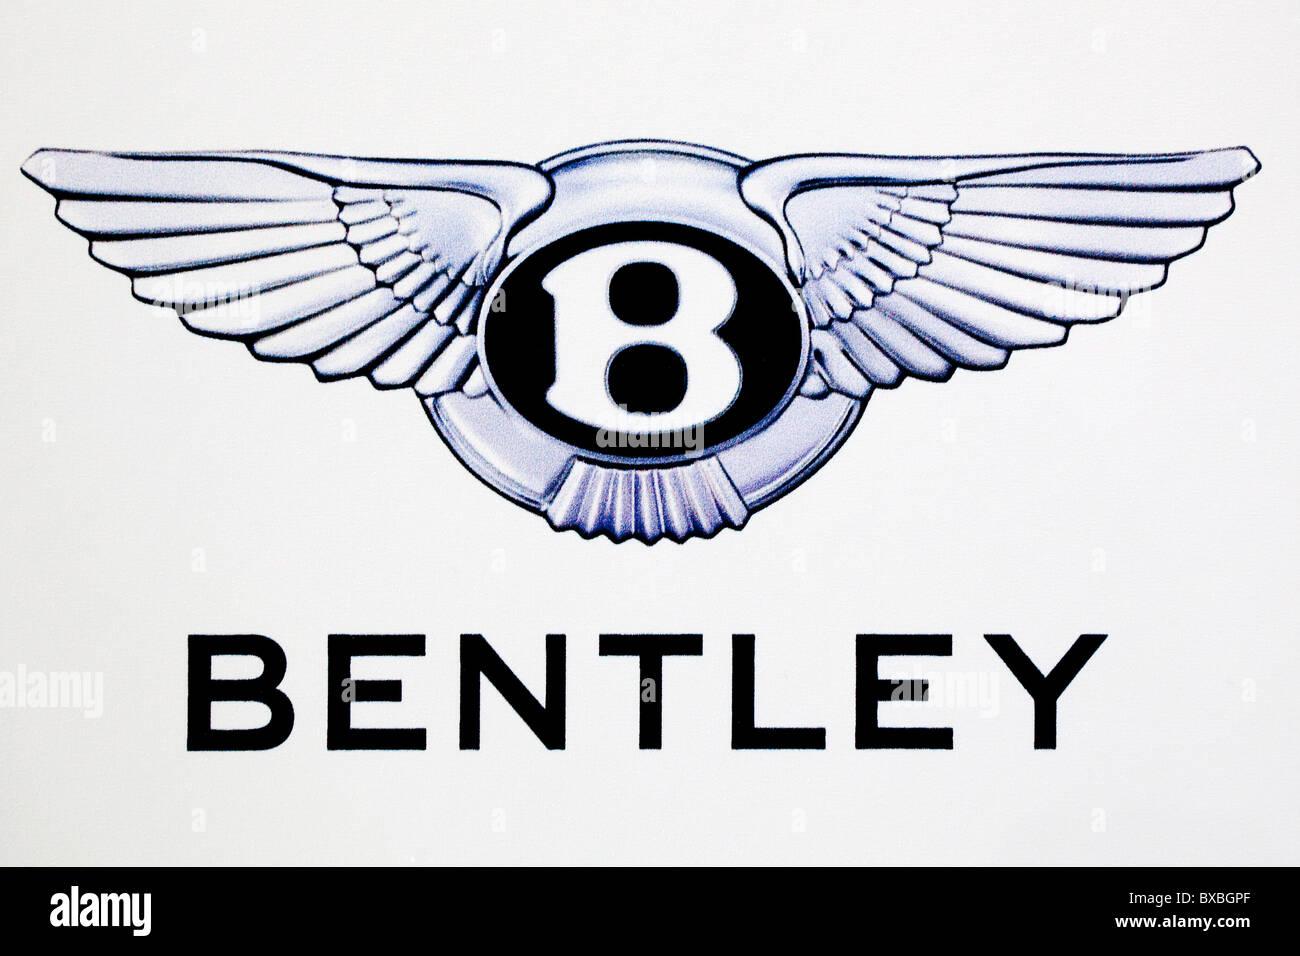 Logo of the Bentley car brand - Stock Image